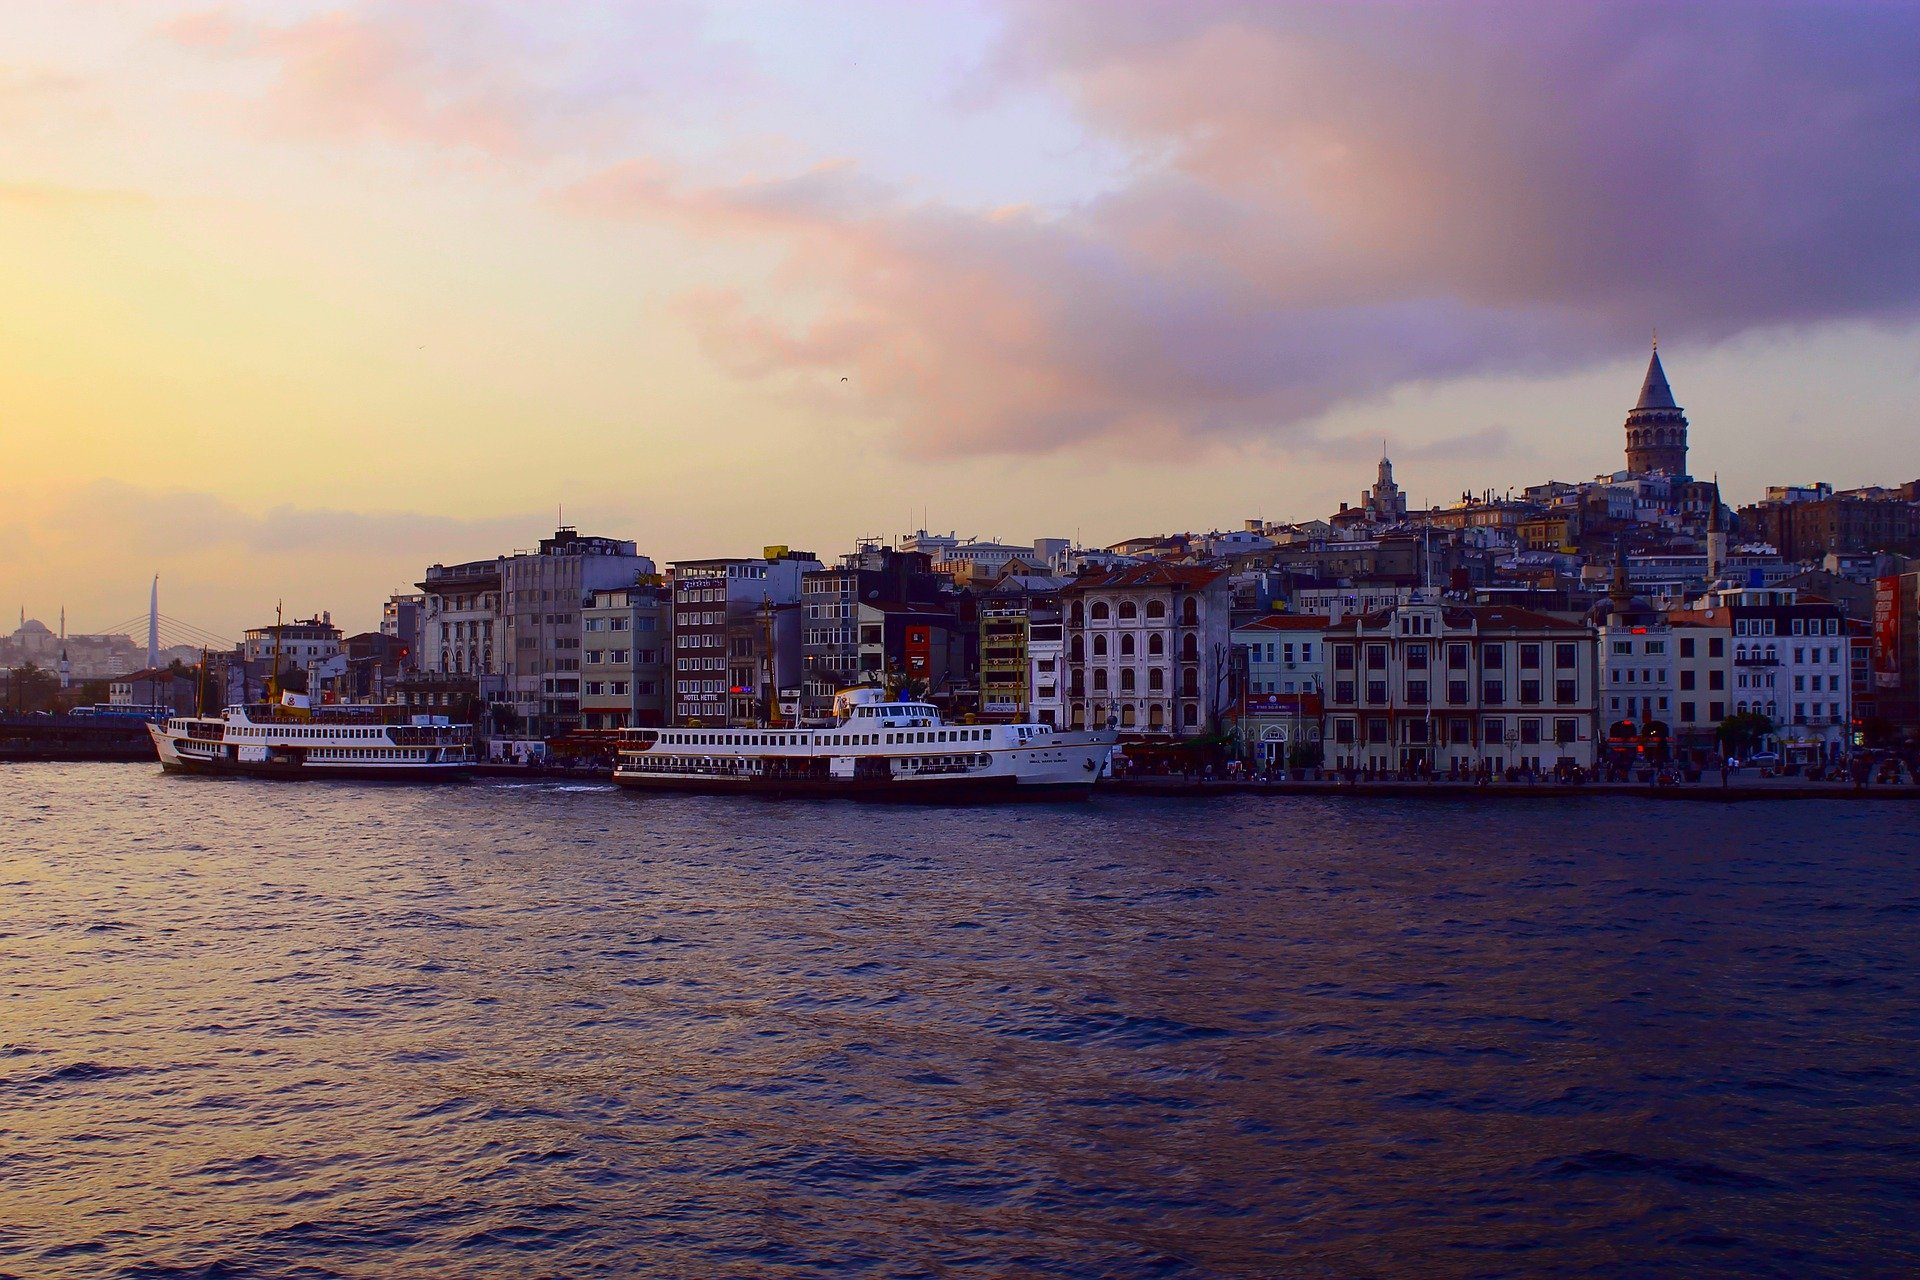 Hafenpanorama Karakoy Türkei |Ein wunderschöner Fleck